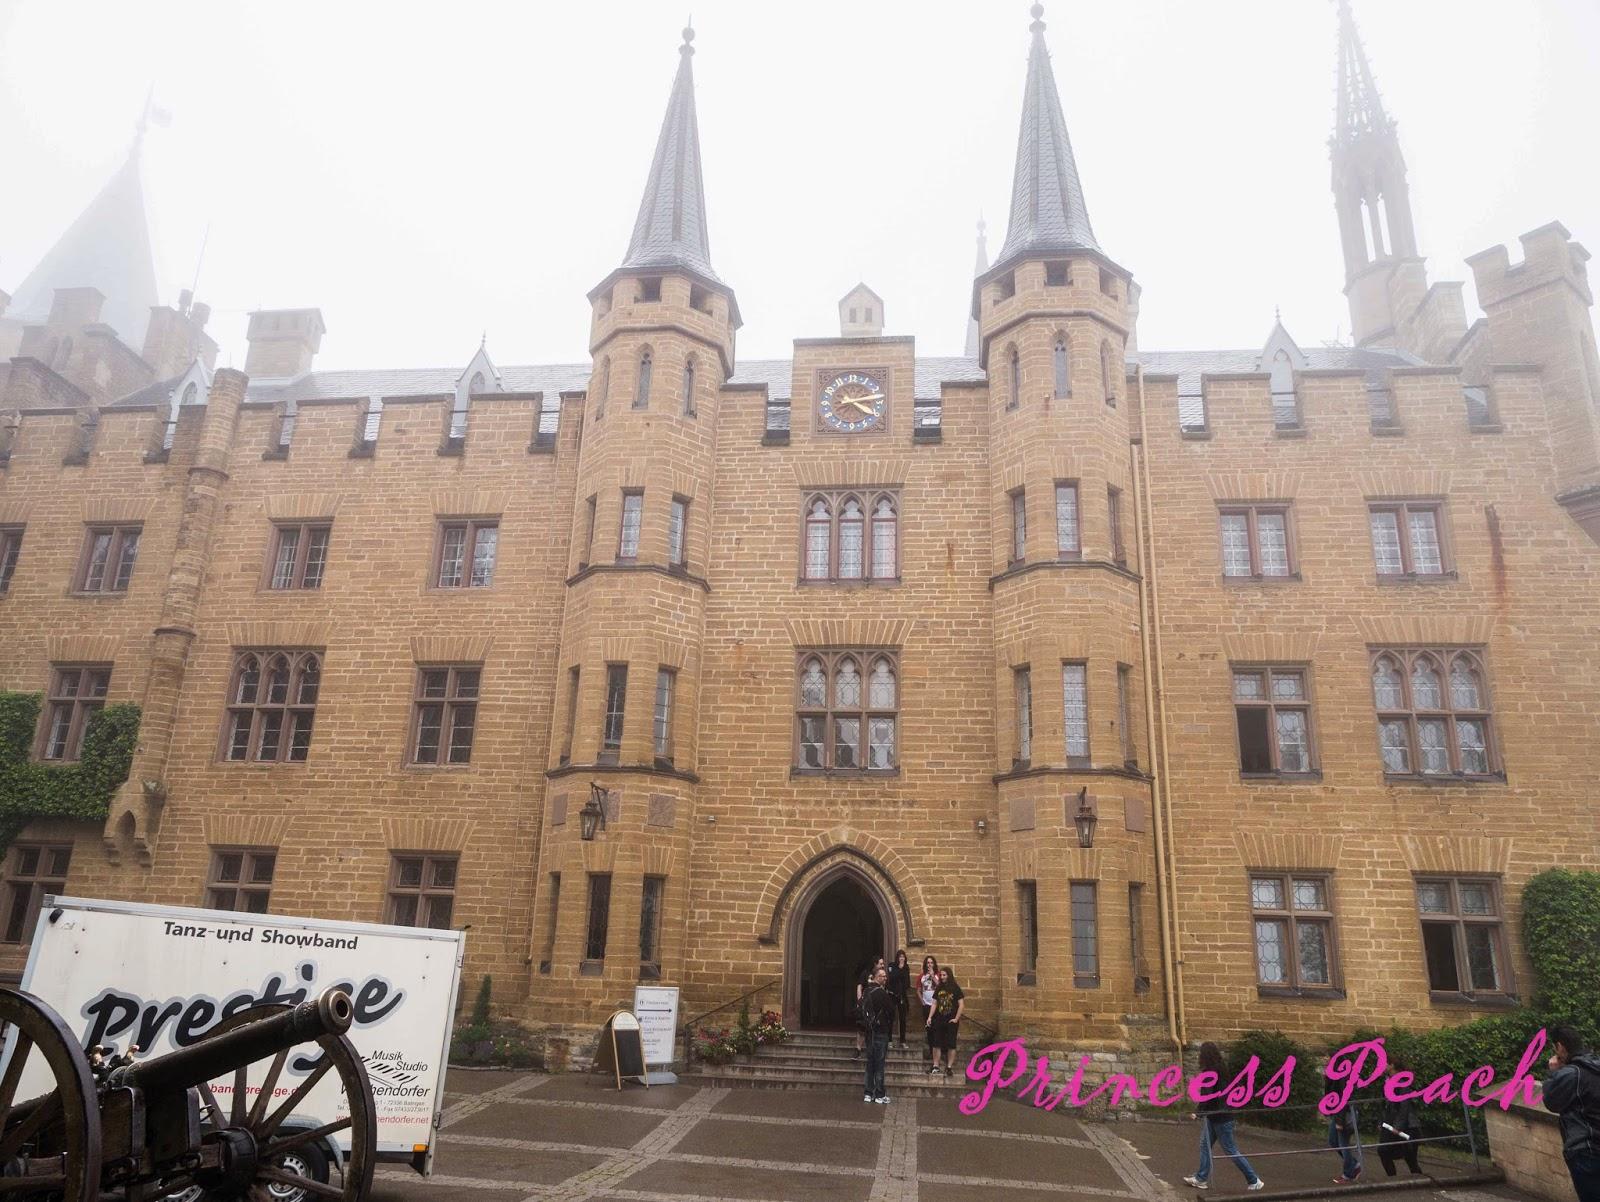 霍亨索倫城堡-Burg-Hohenzollern